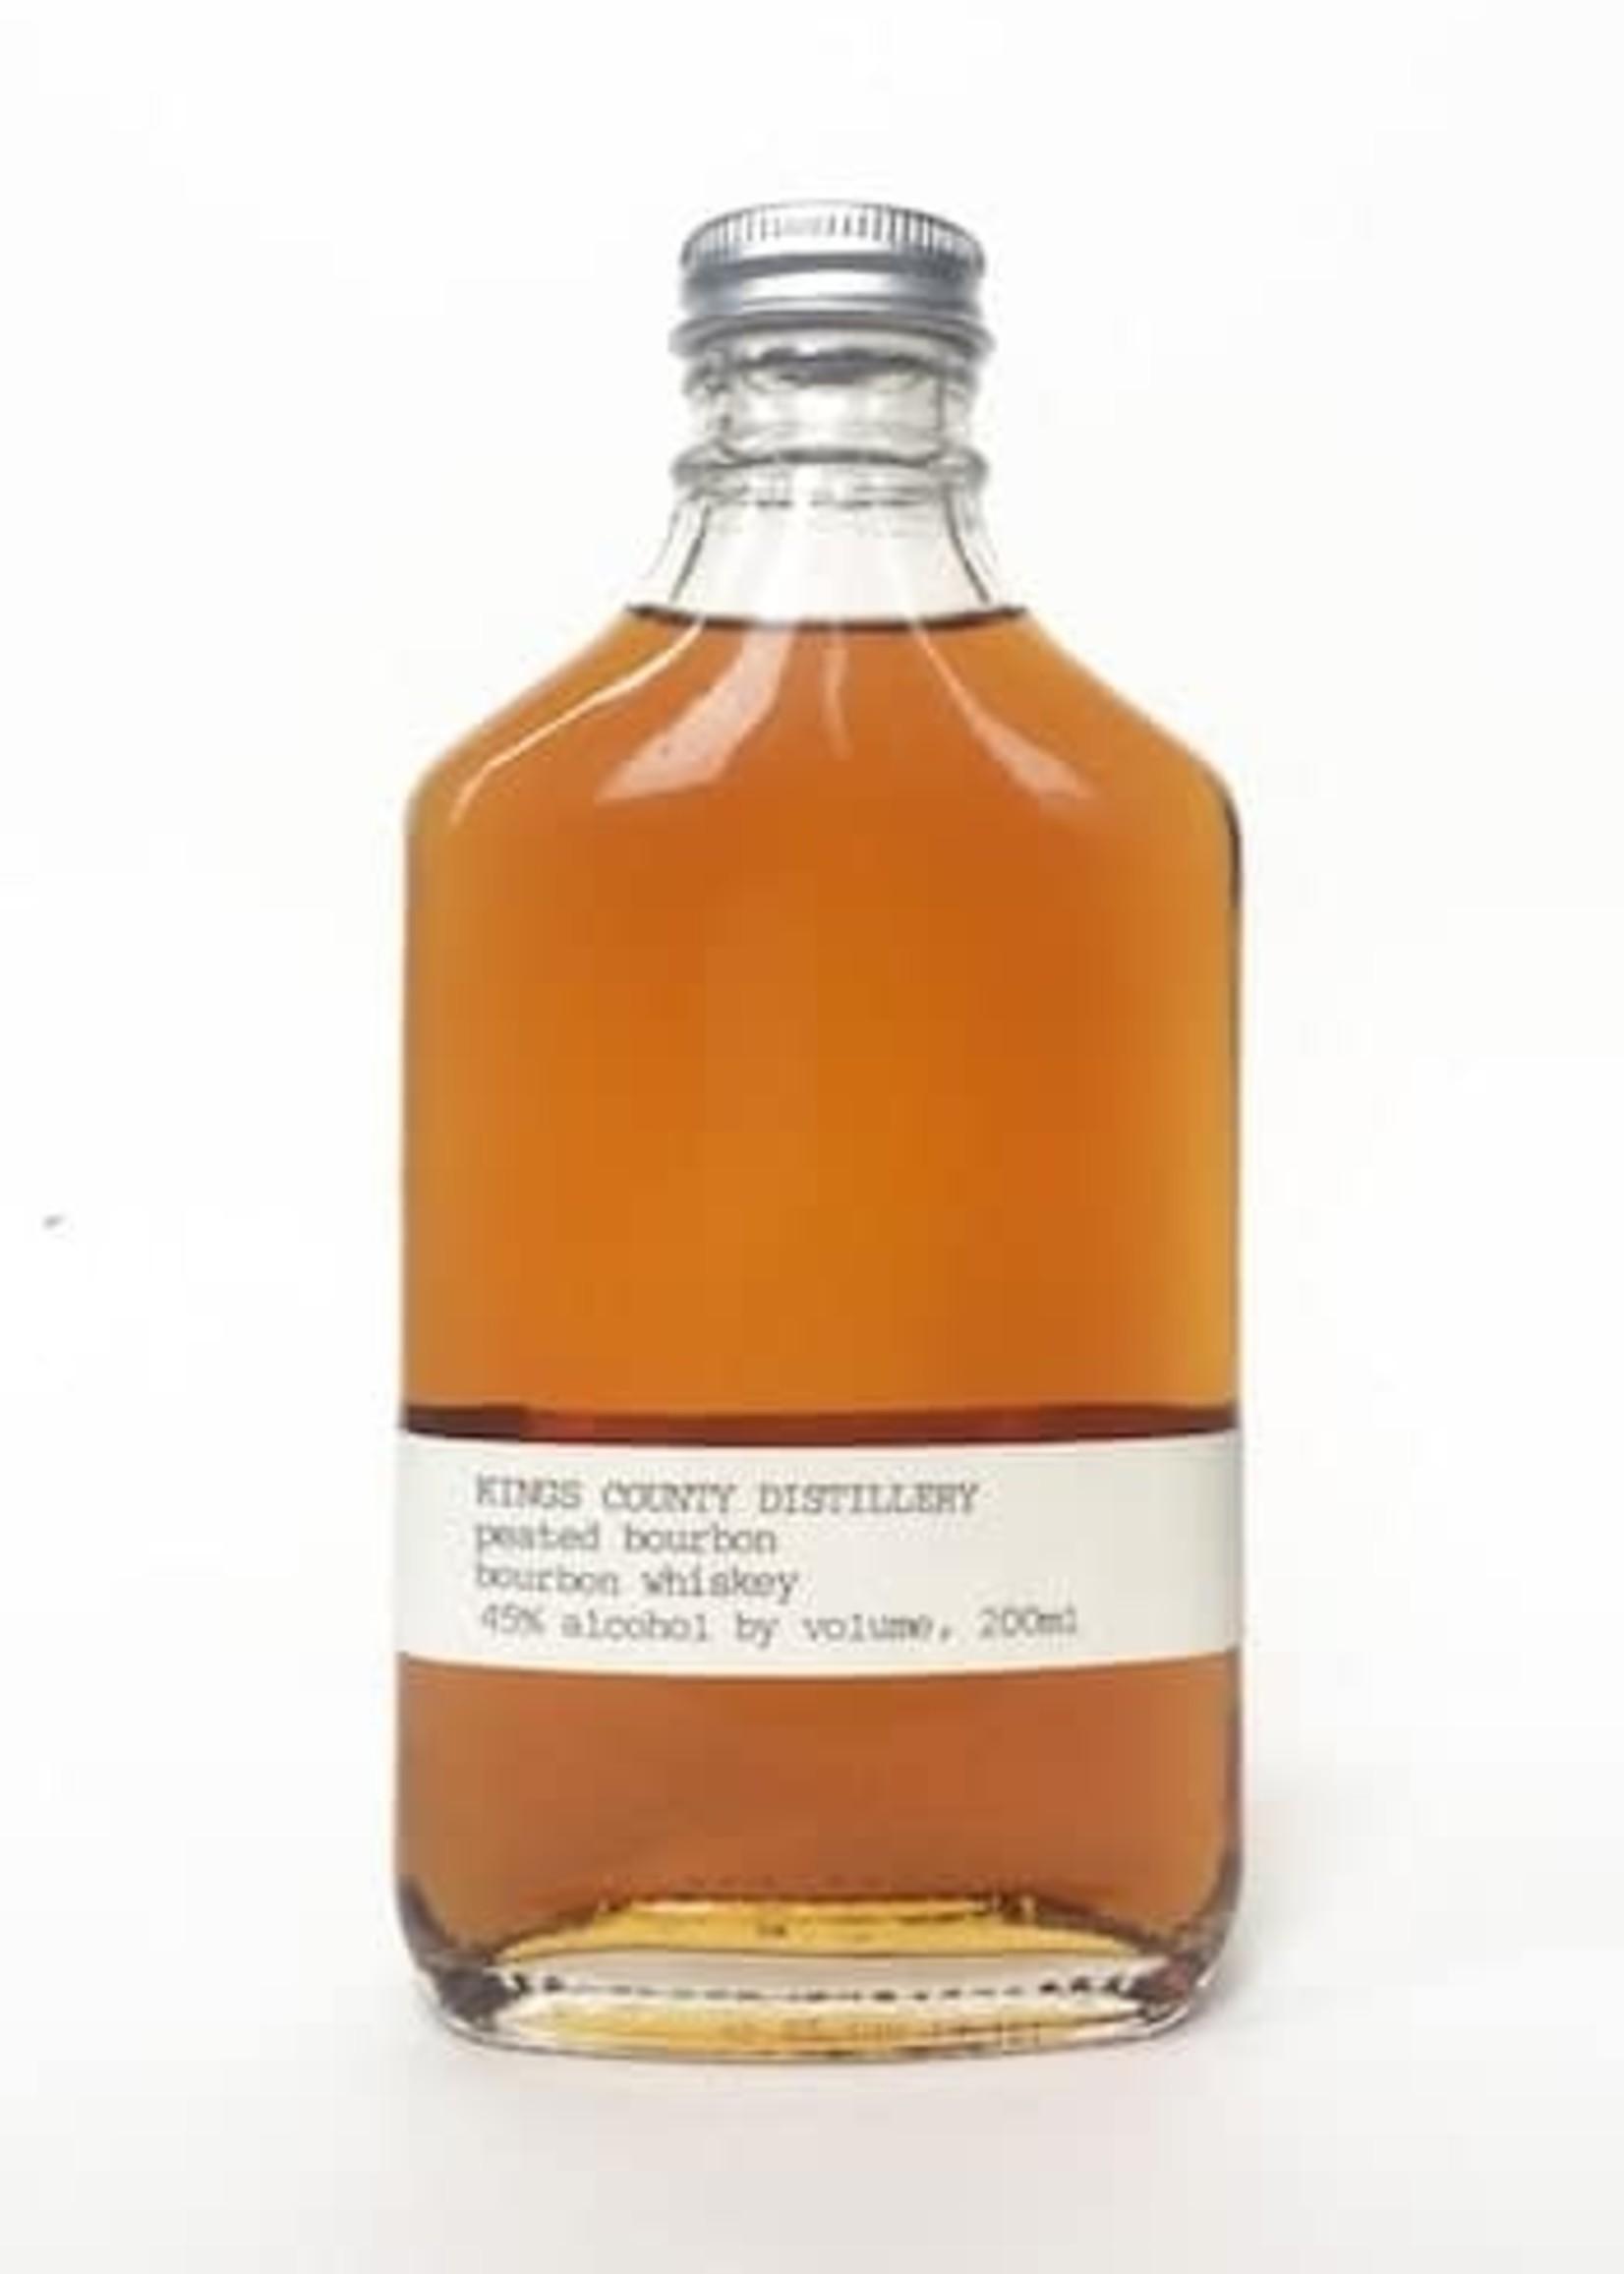 Kings County Peated Bourbon 750ml